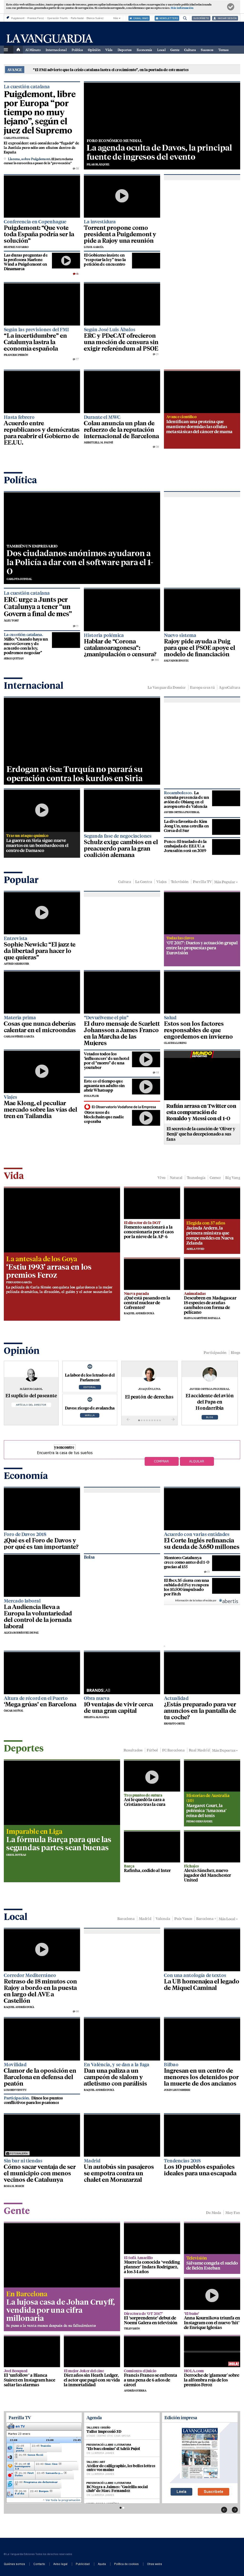 La Vanguardia at Tuesday Jan. 23, 2018, 2:11 a.m. UTC